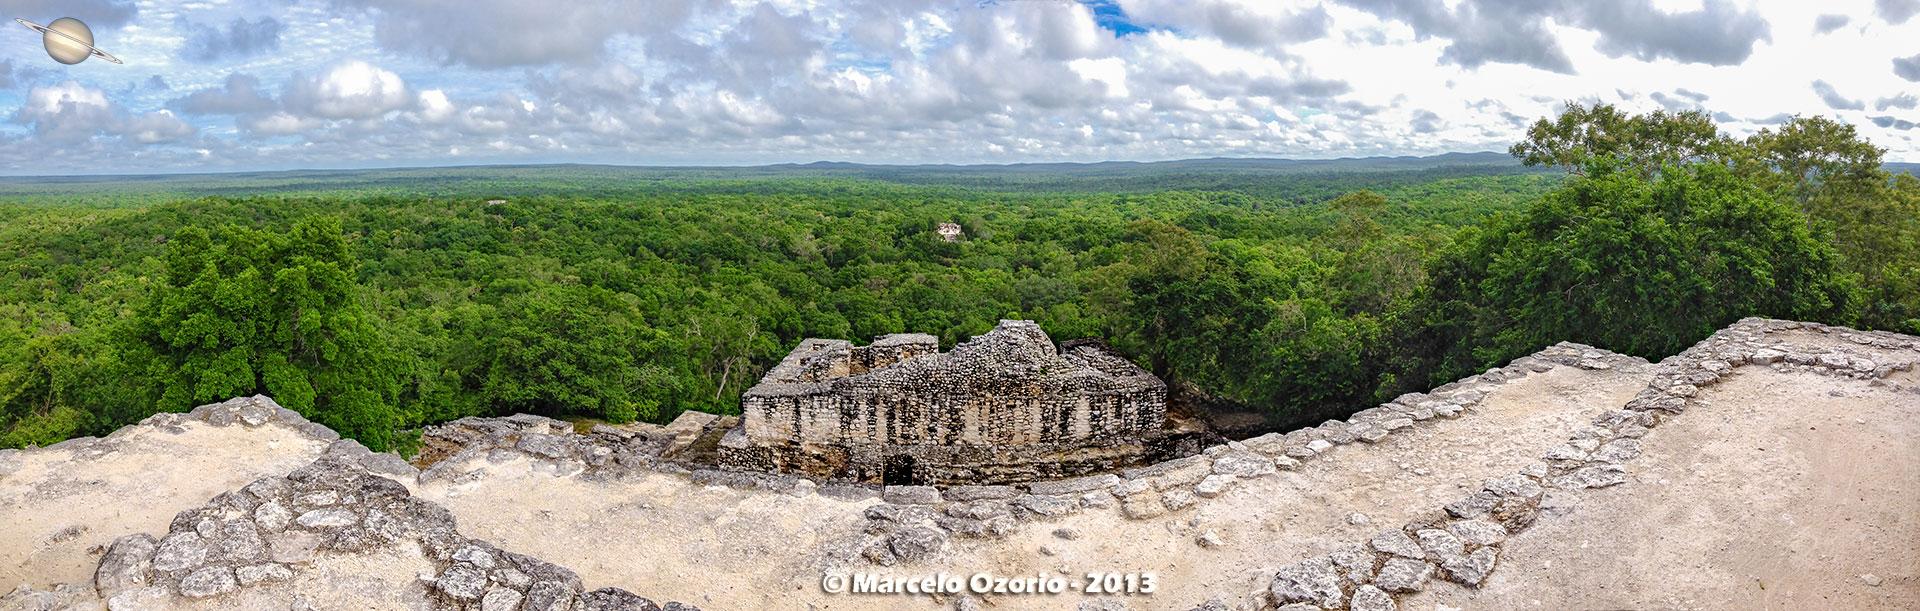 calakmul mayan civilization mexico 46 - Calakmul, City of the Two Adjacent Pyramids - Mexico